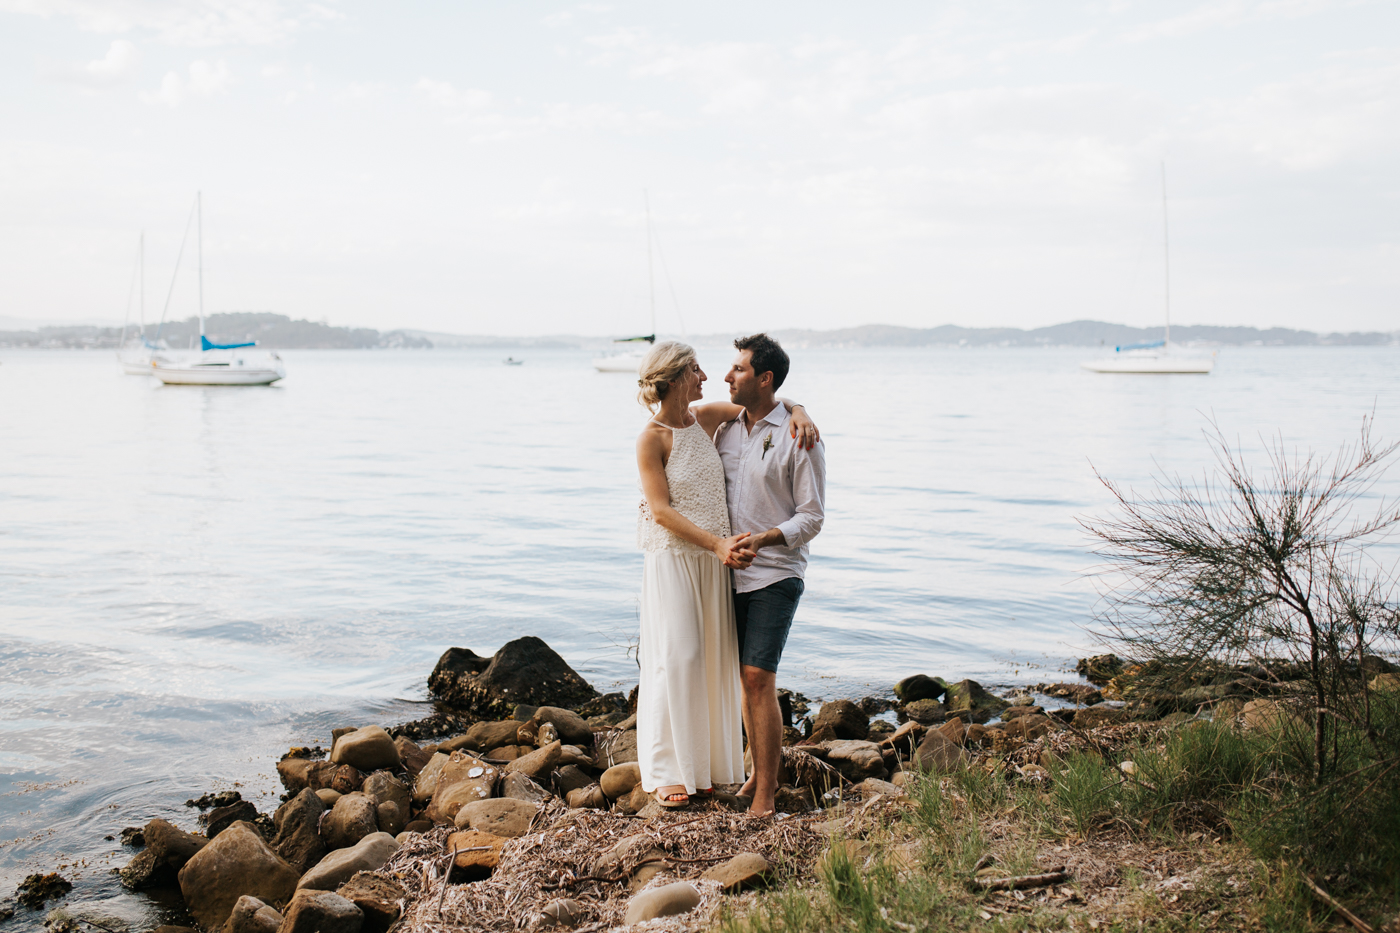 Emma & Ben - Lake Macquarie - Hunter Valley Wedding - Samantha Heather Photography-192.jpg